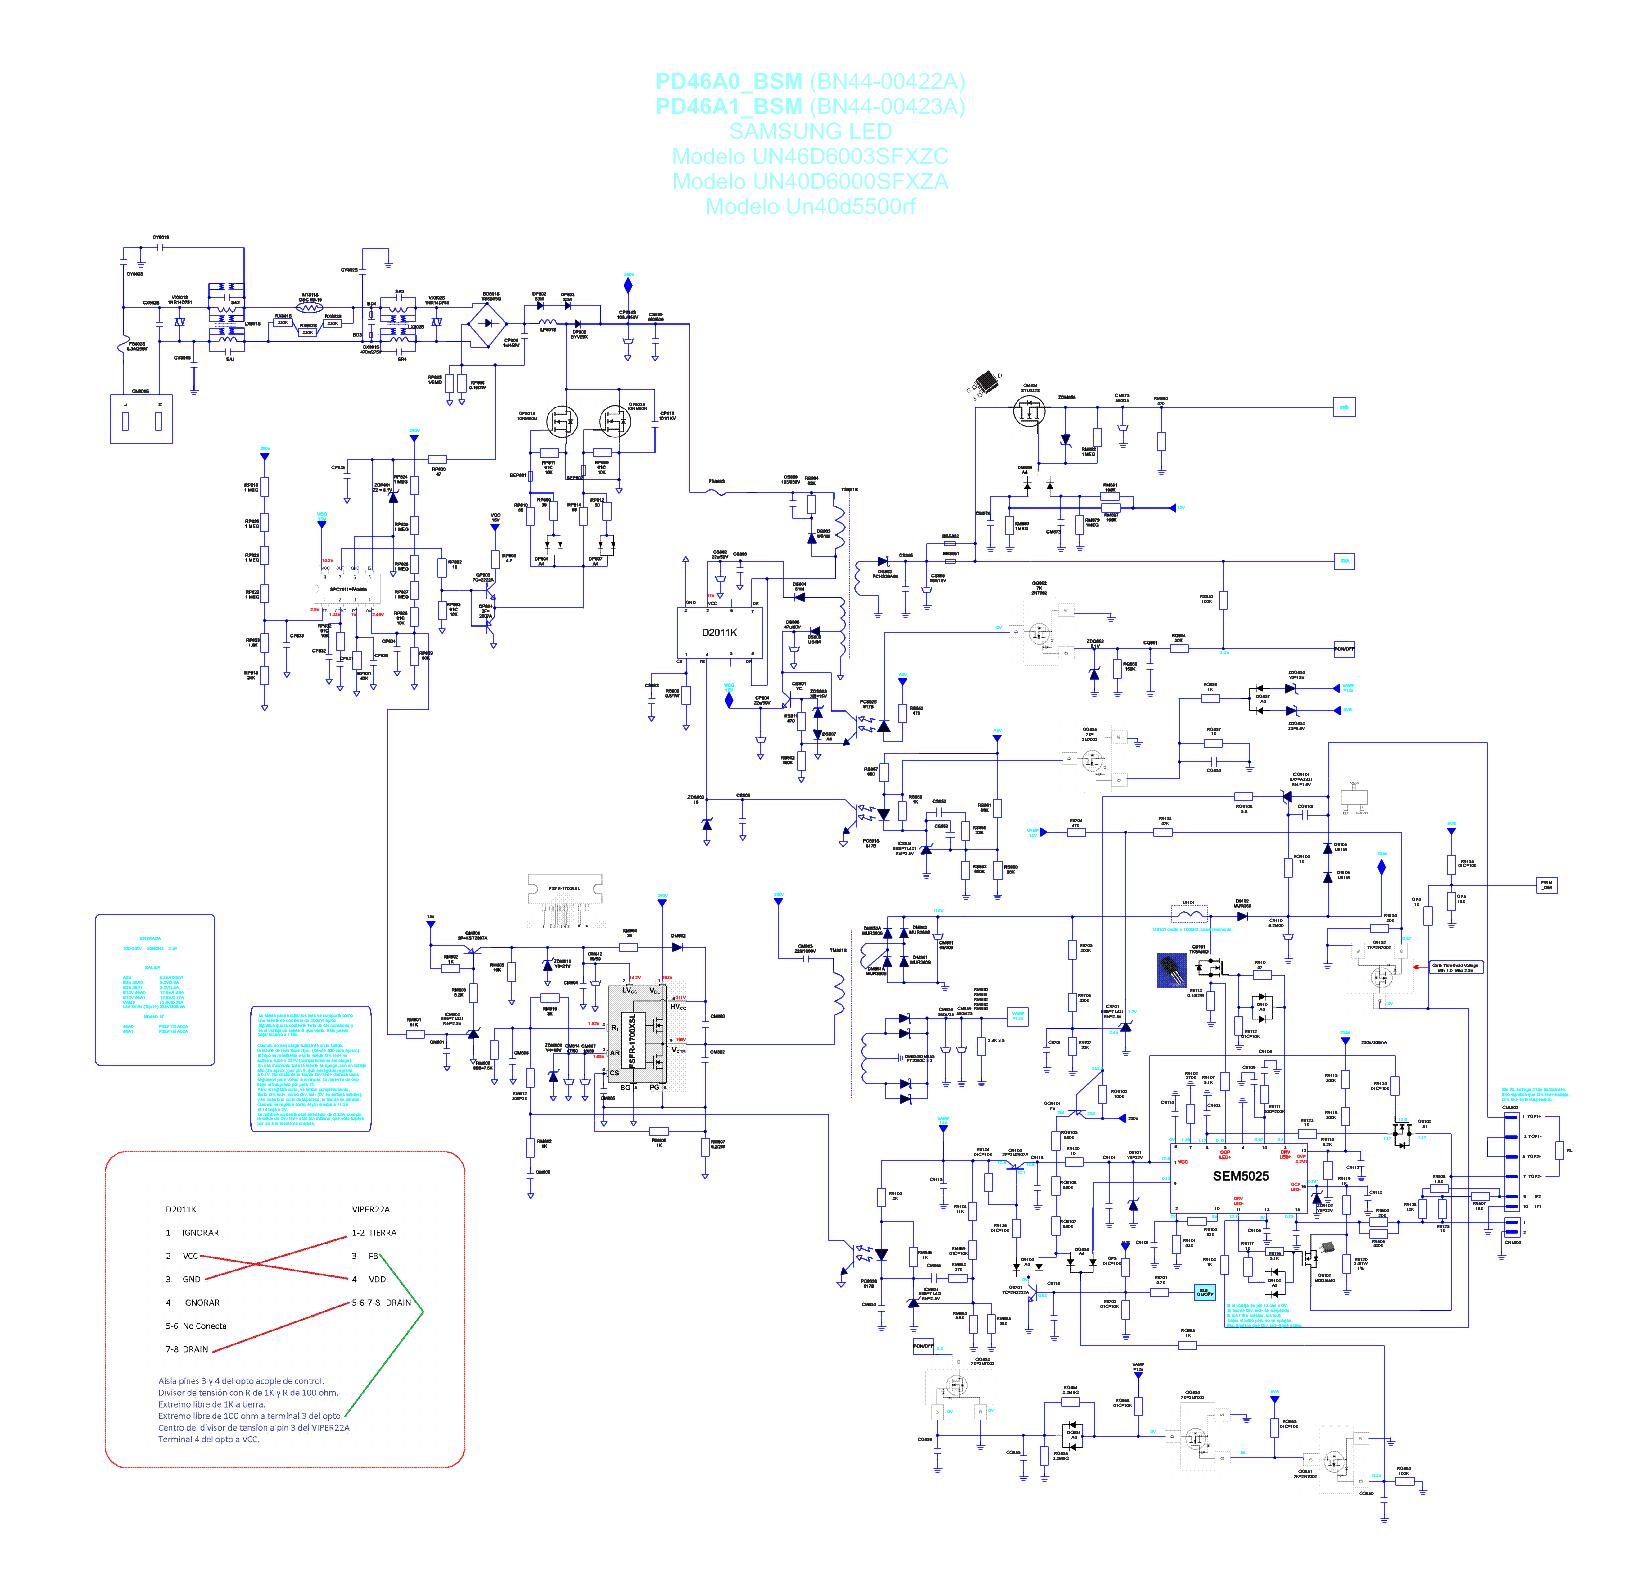 samsung frame tv manual pdf